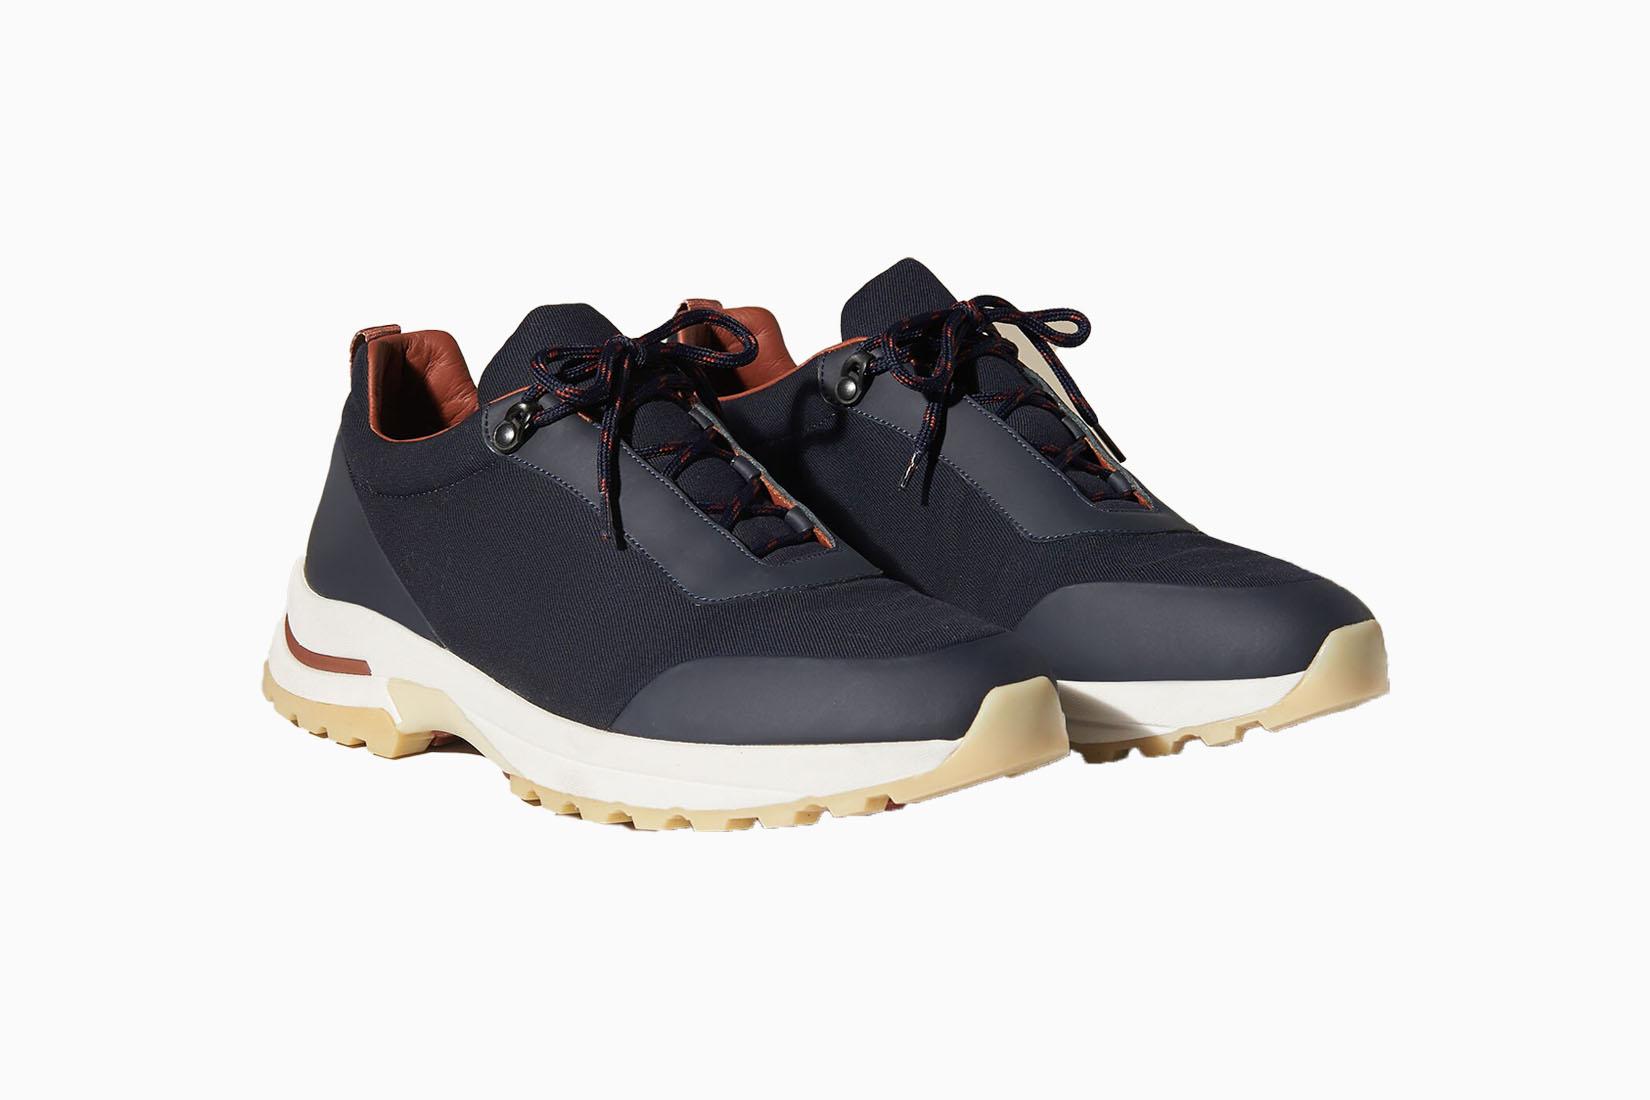 best waterproof shoes men lorno piana review Luxe Digital